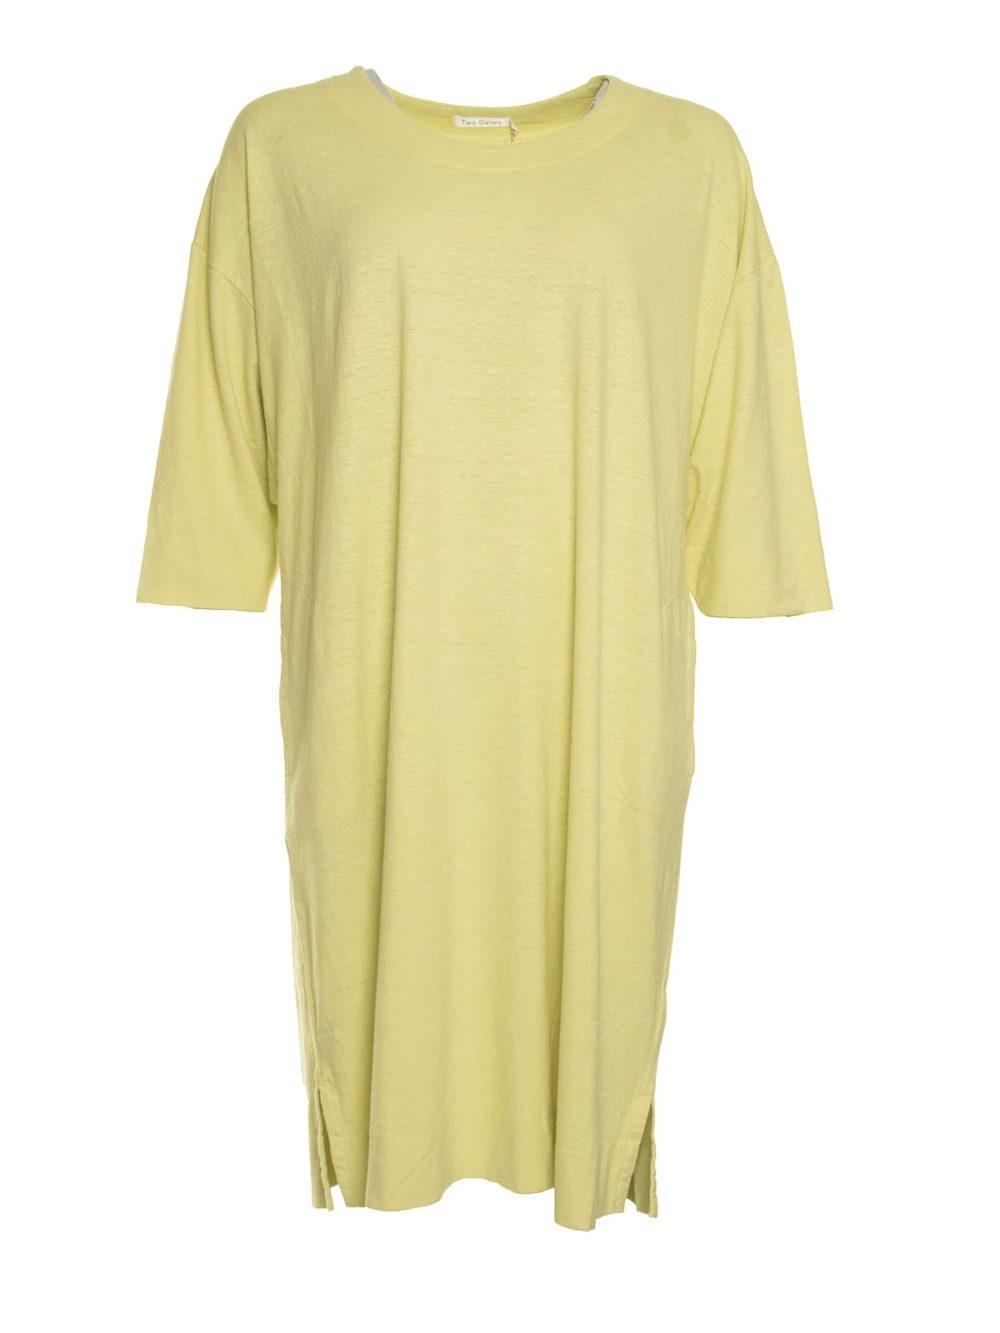 Hye Dress Two Danes Katie Kerr Women's Clothing